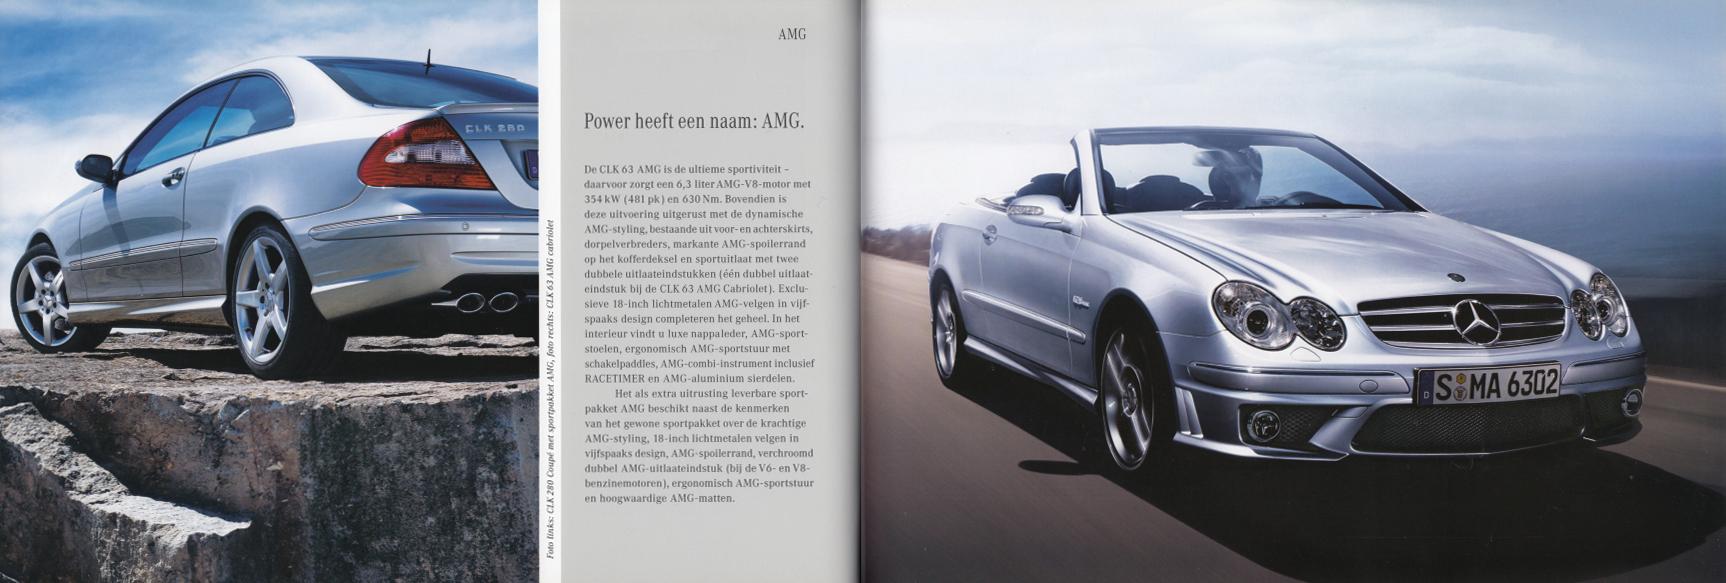 (A/C209): Catálogo 2006 - neerlandês 025